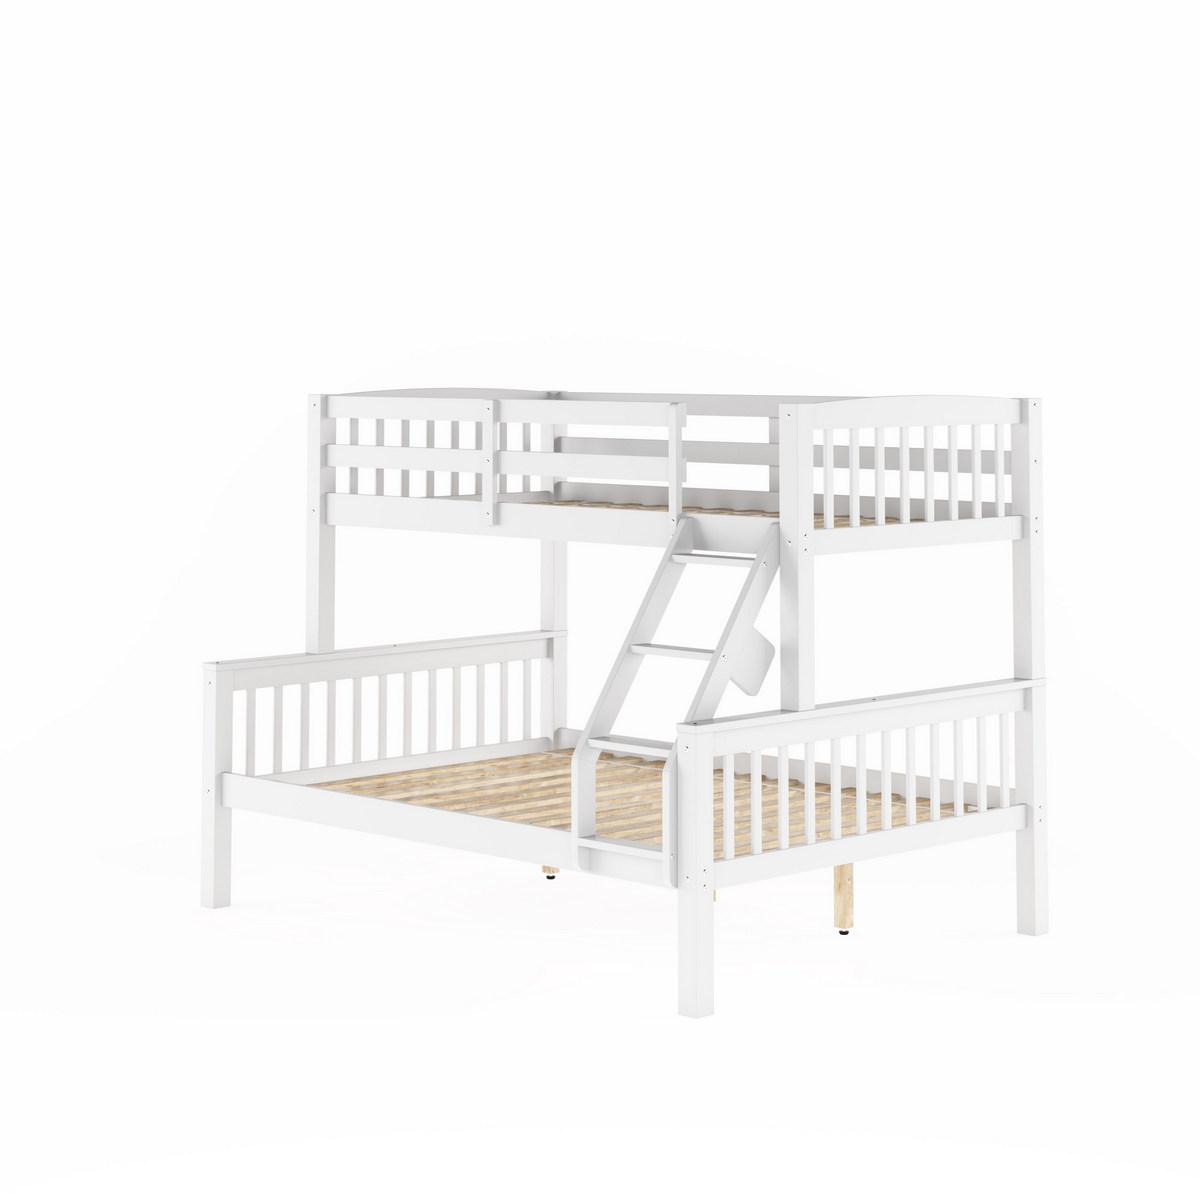 Corliving Bdn Dakota White Twin Single Over Full Double Bunk Bed